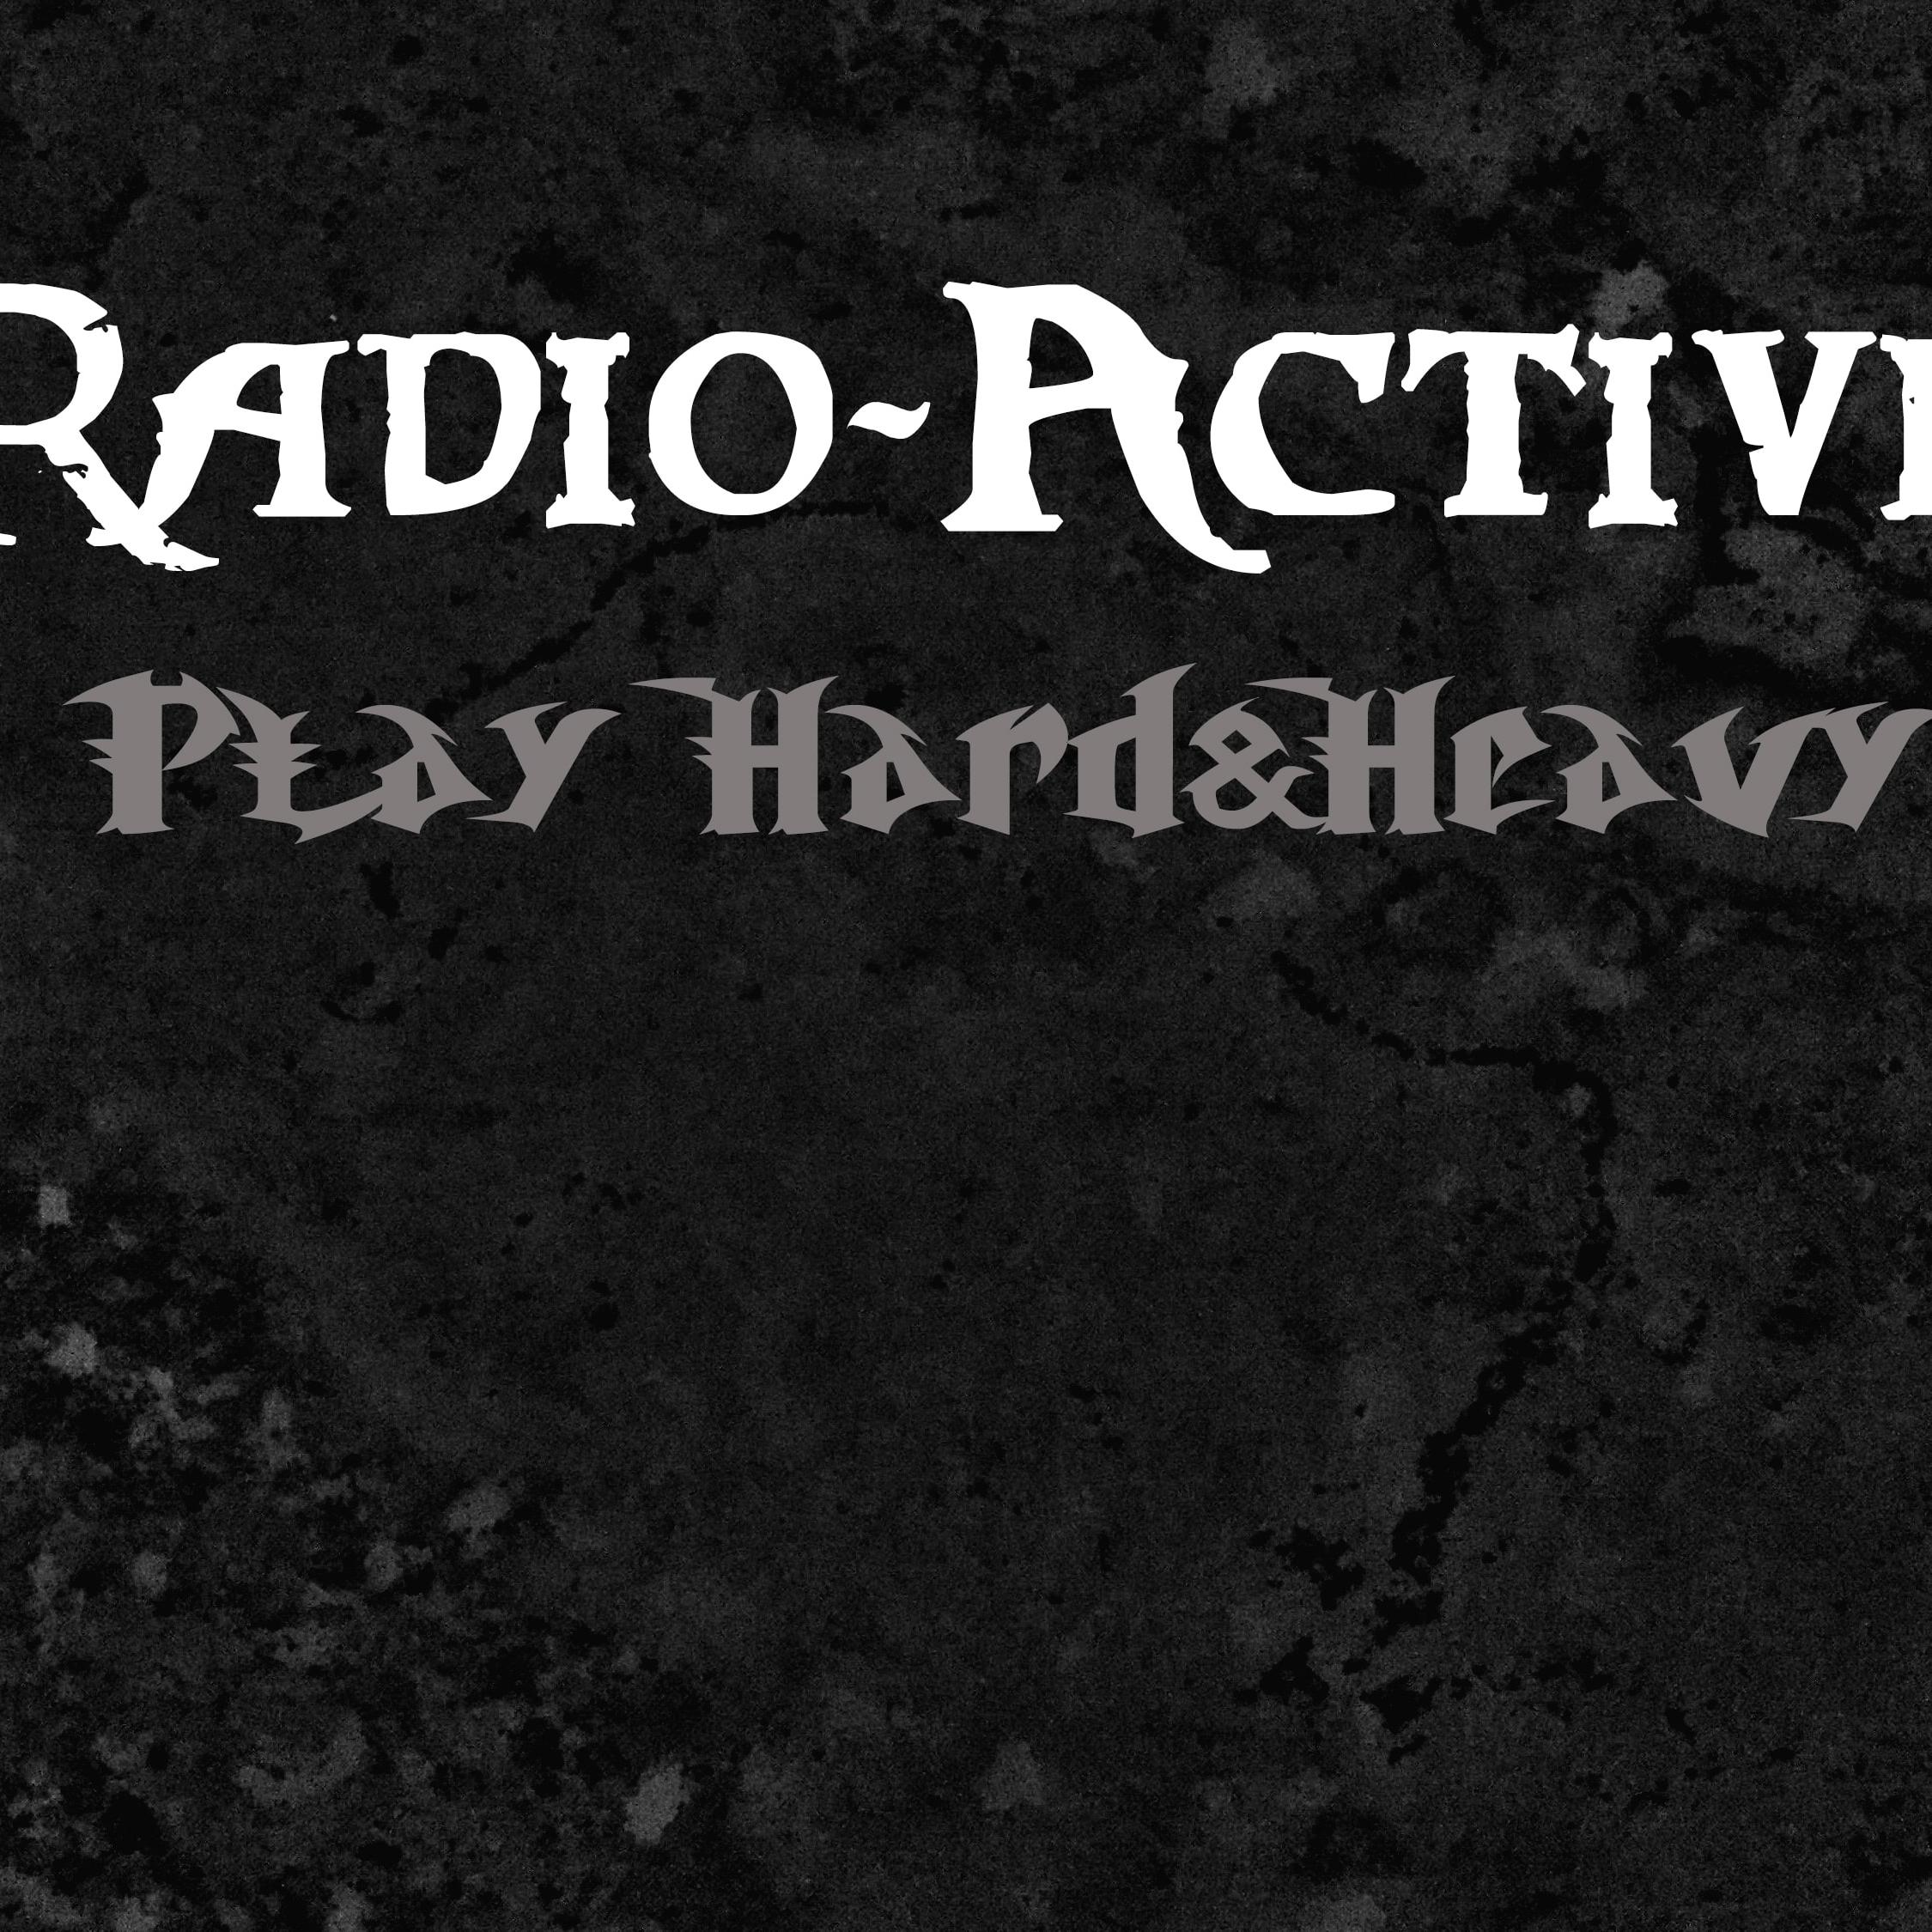 Radio-Active ukrrock